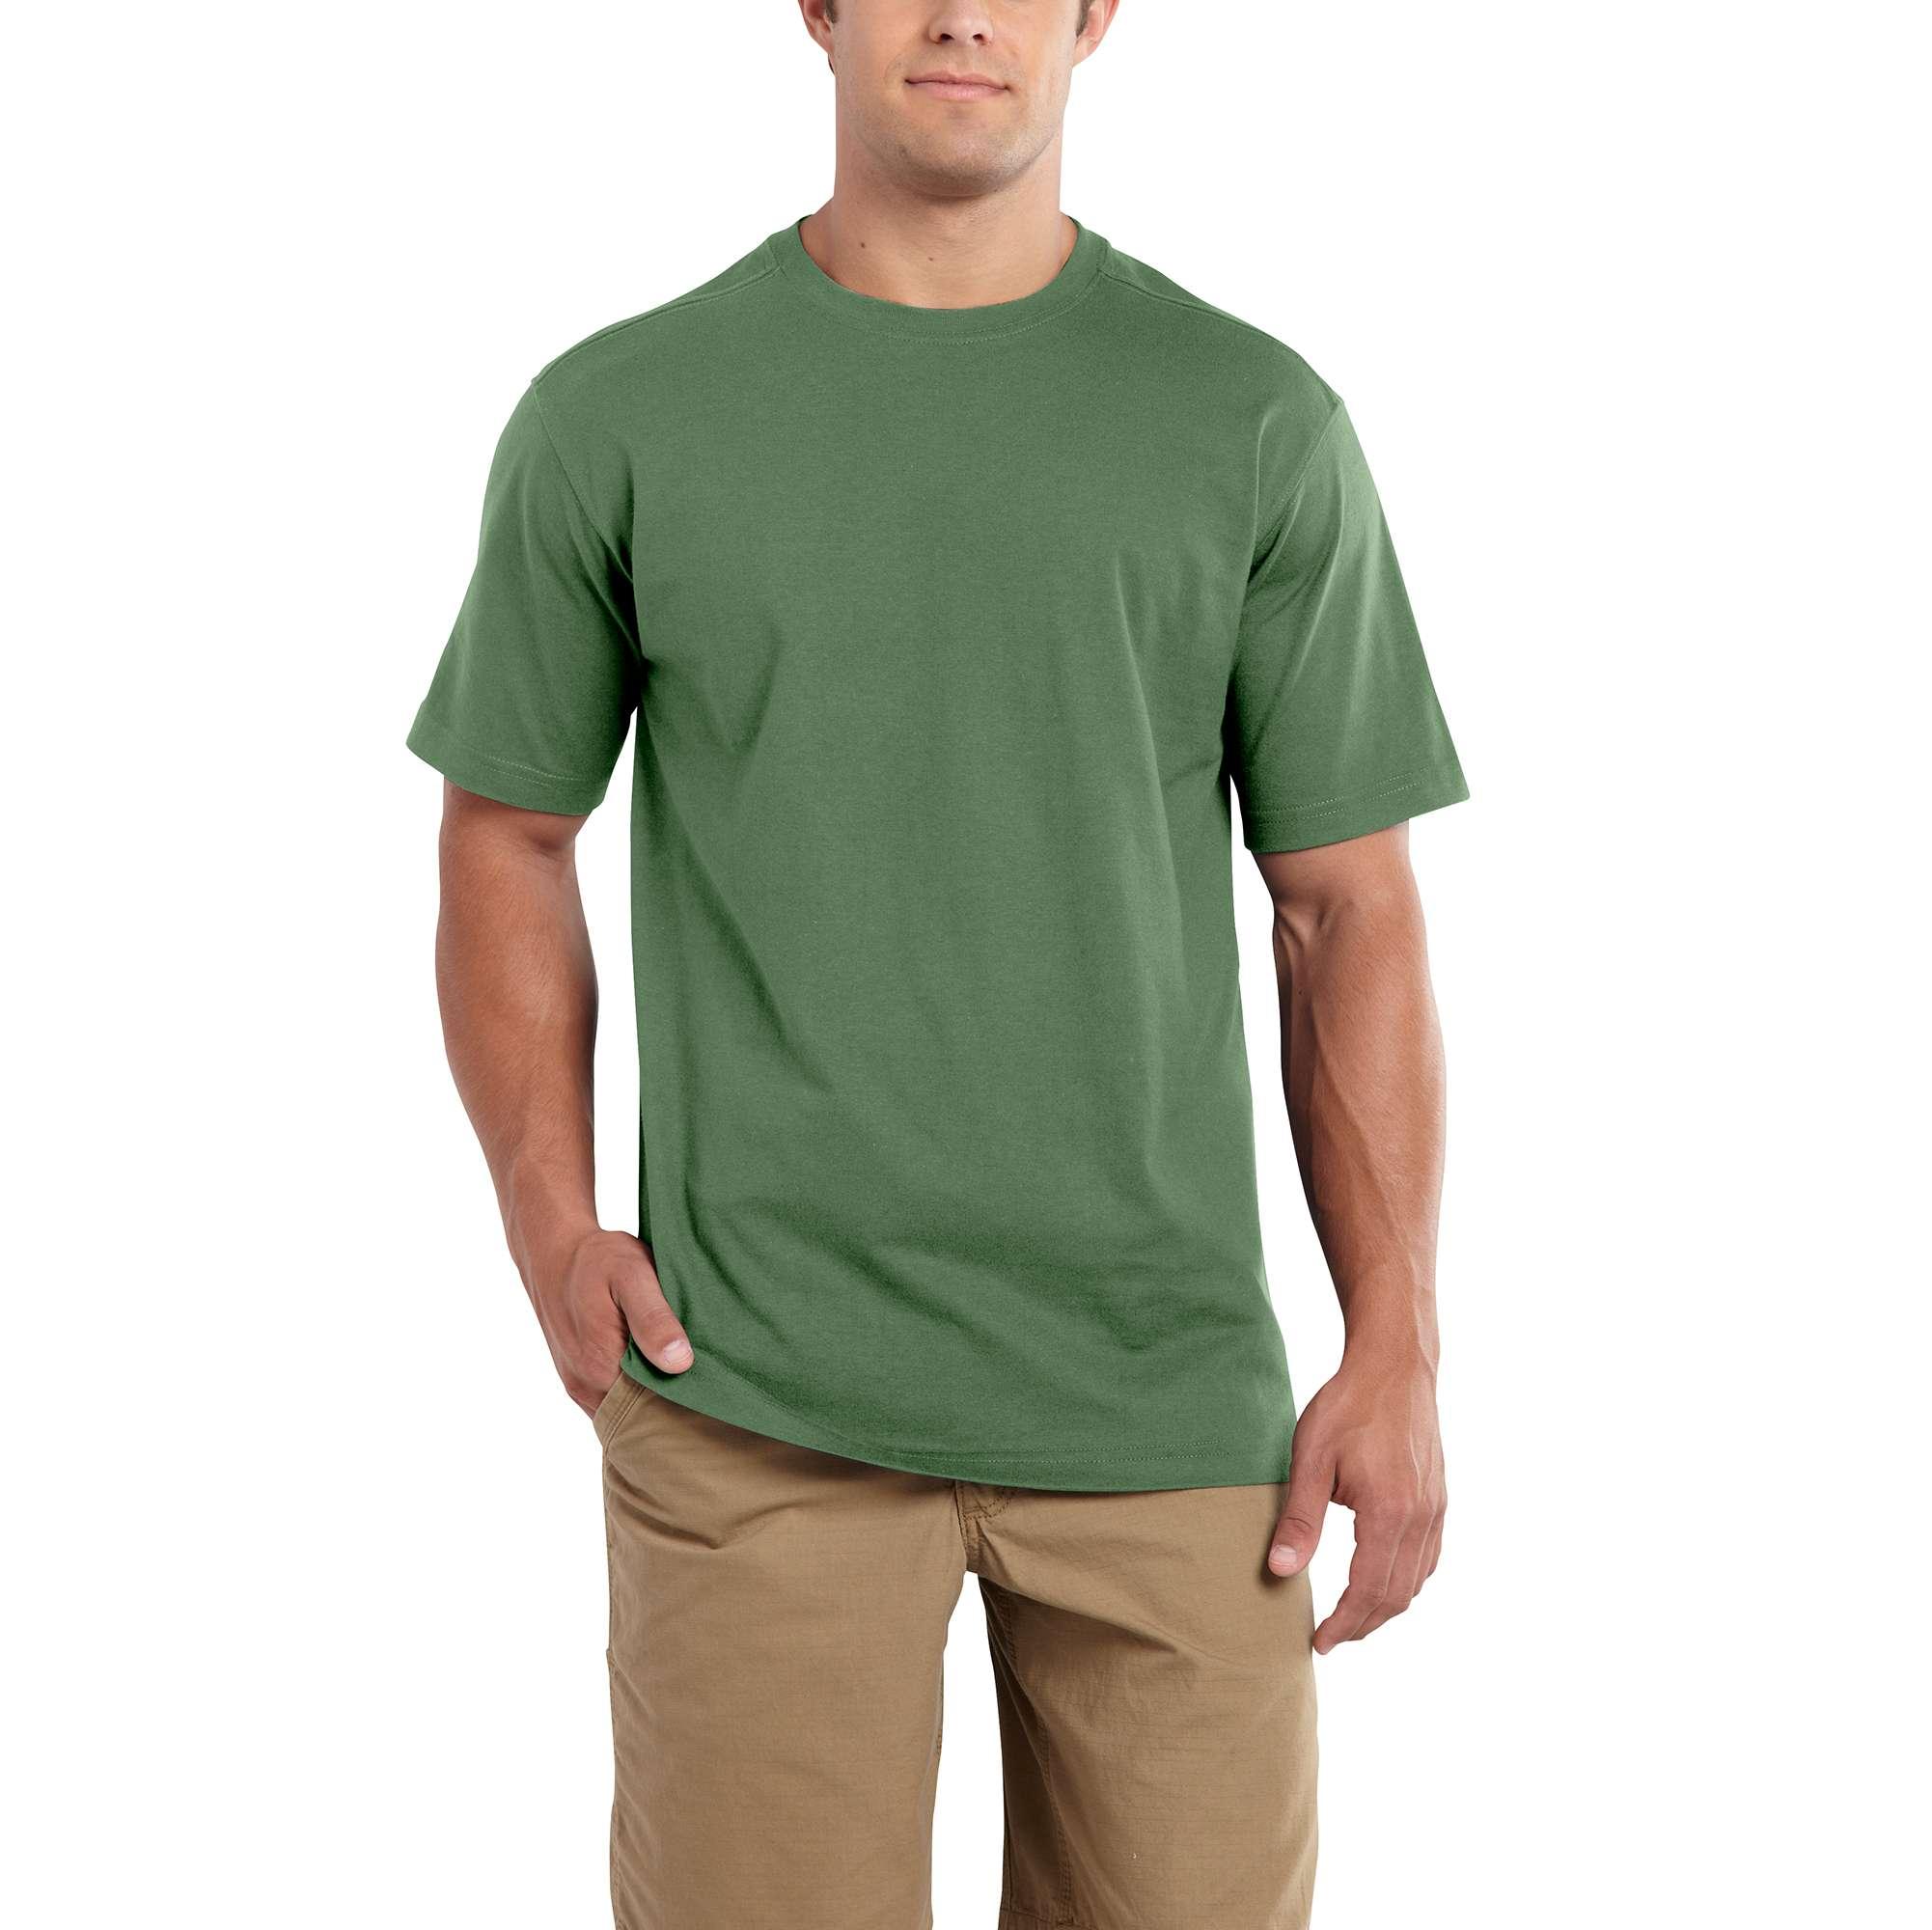 carhartt maddock non-pocket short-sleeve t-shirt herb xl